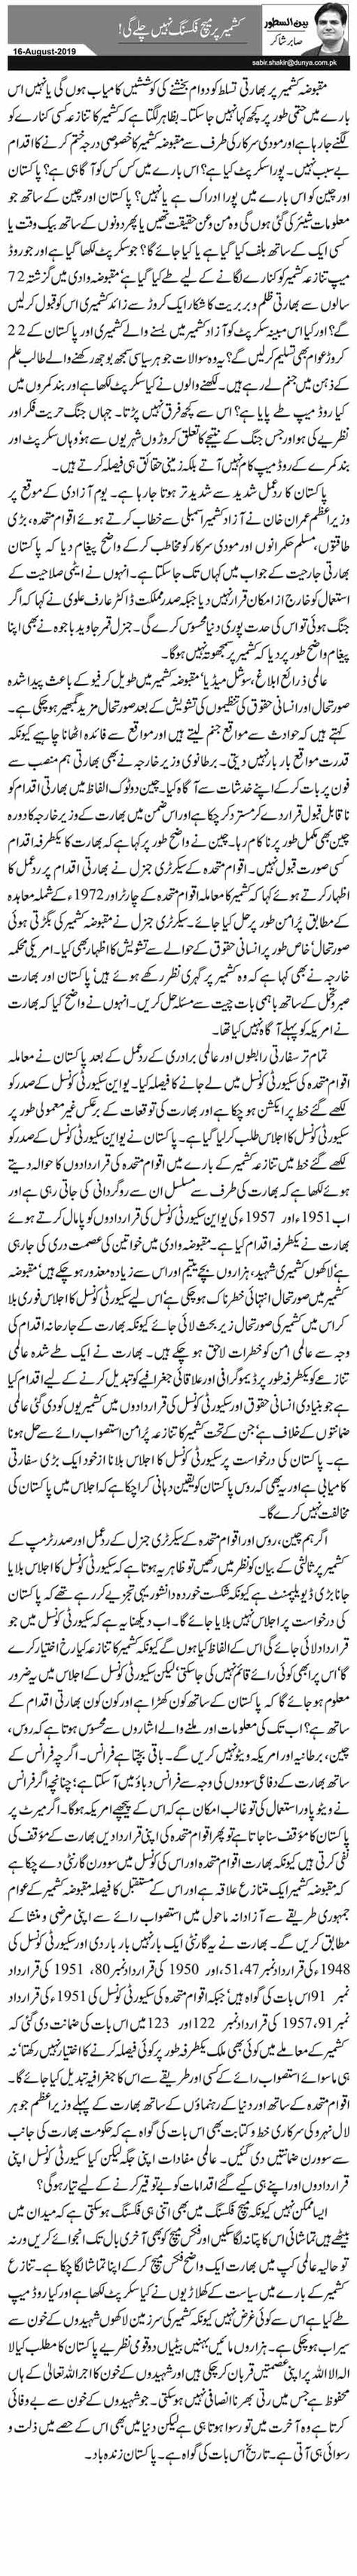 Modi Ko Faisla Tabdeel Karna Pare Ga! By Sabir Shakir (Dated: Saturday, August 17, 2019)